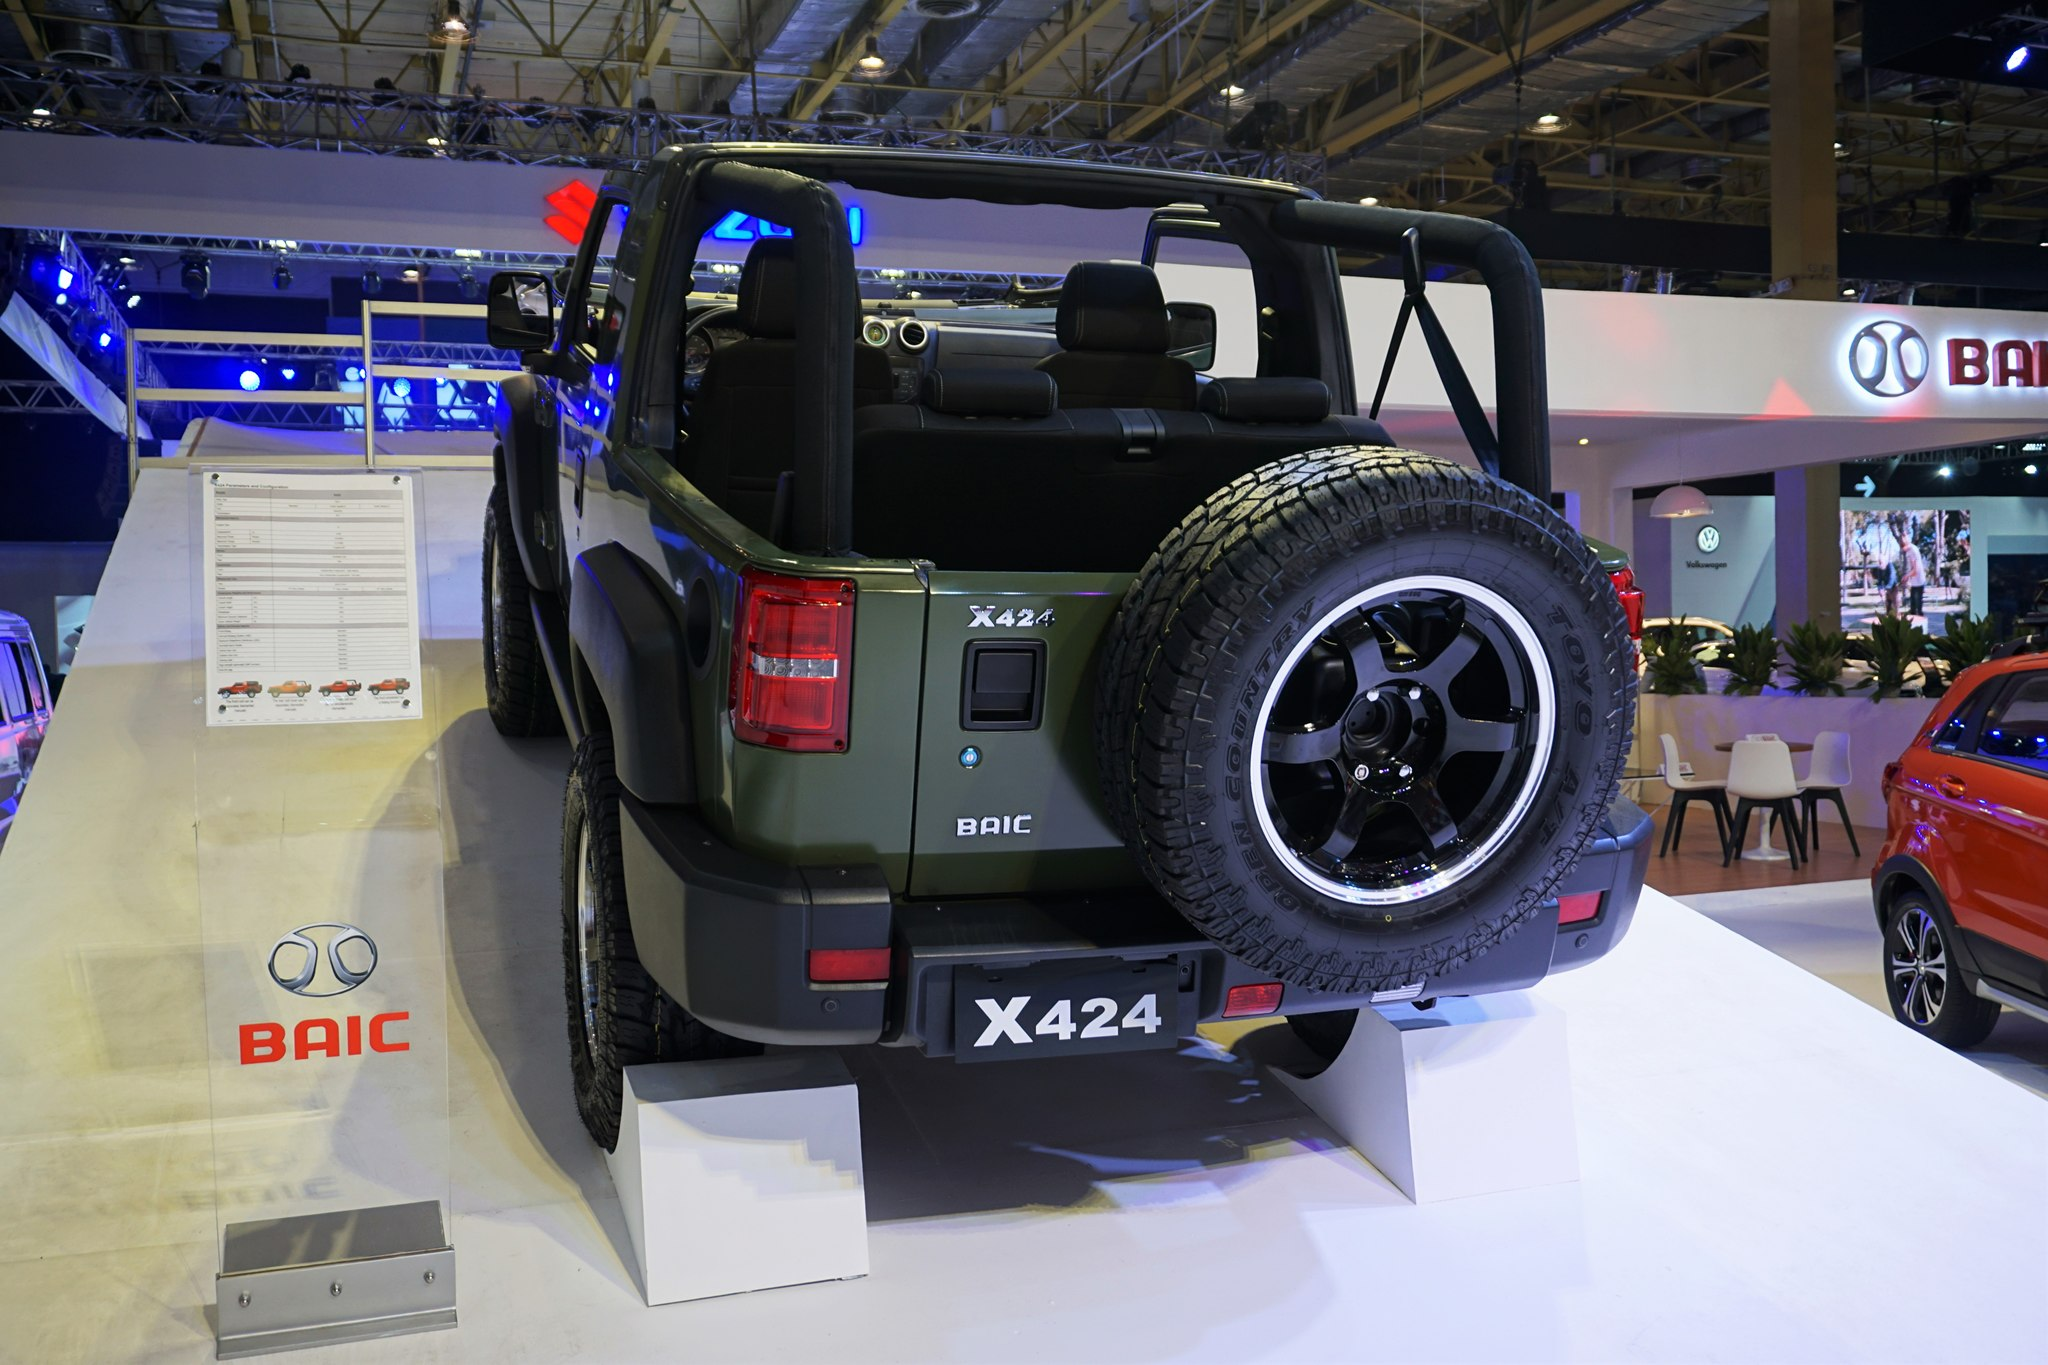 baic-x424-philippine-international-motor-show-2016-2